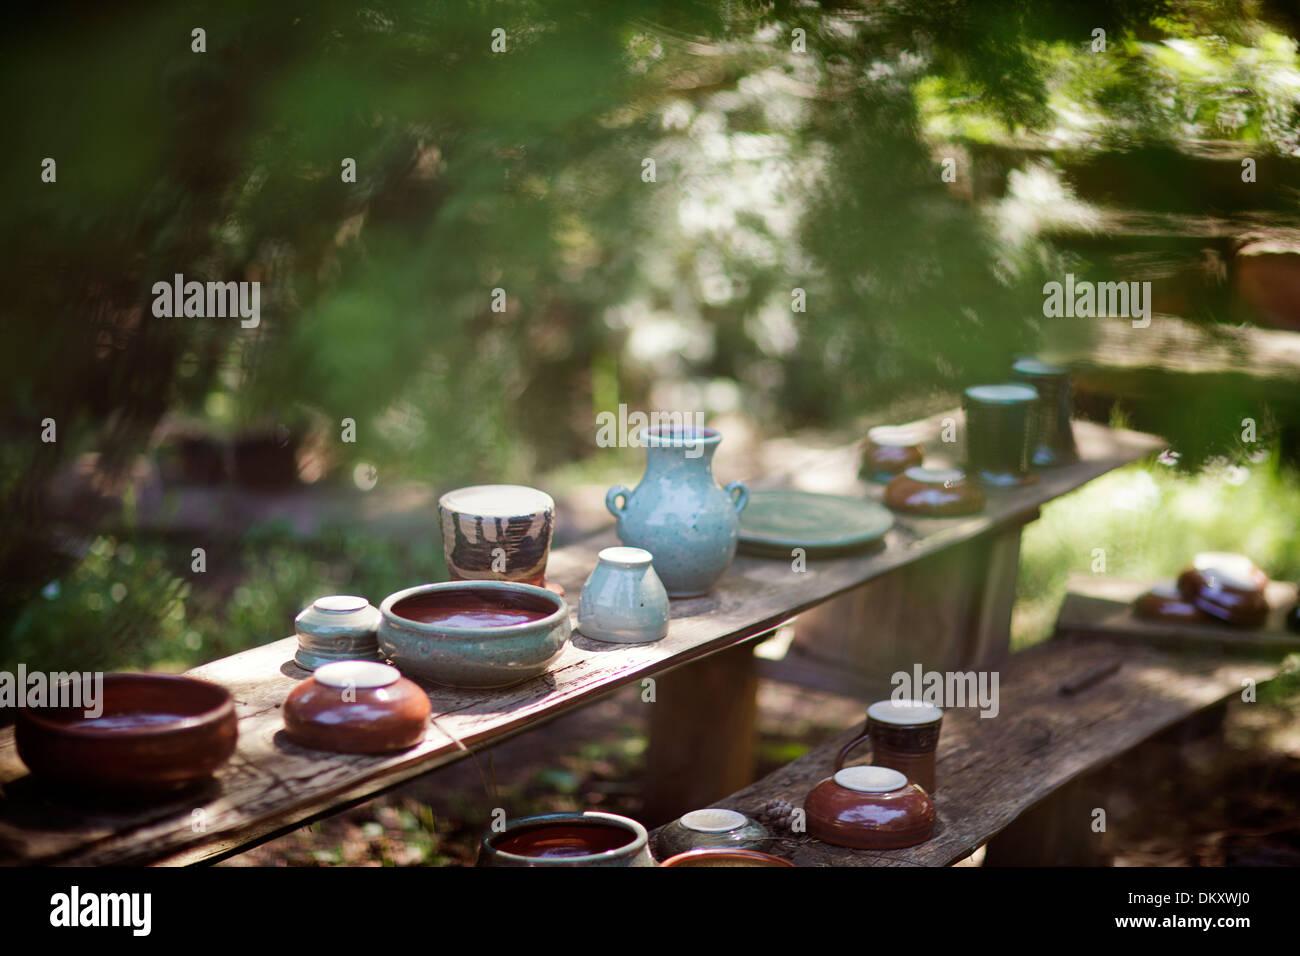 Handmade Pottery on a rustic wood shelf. - Stock Image